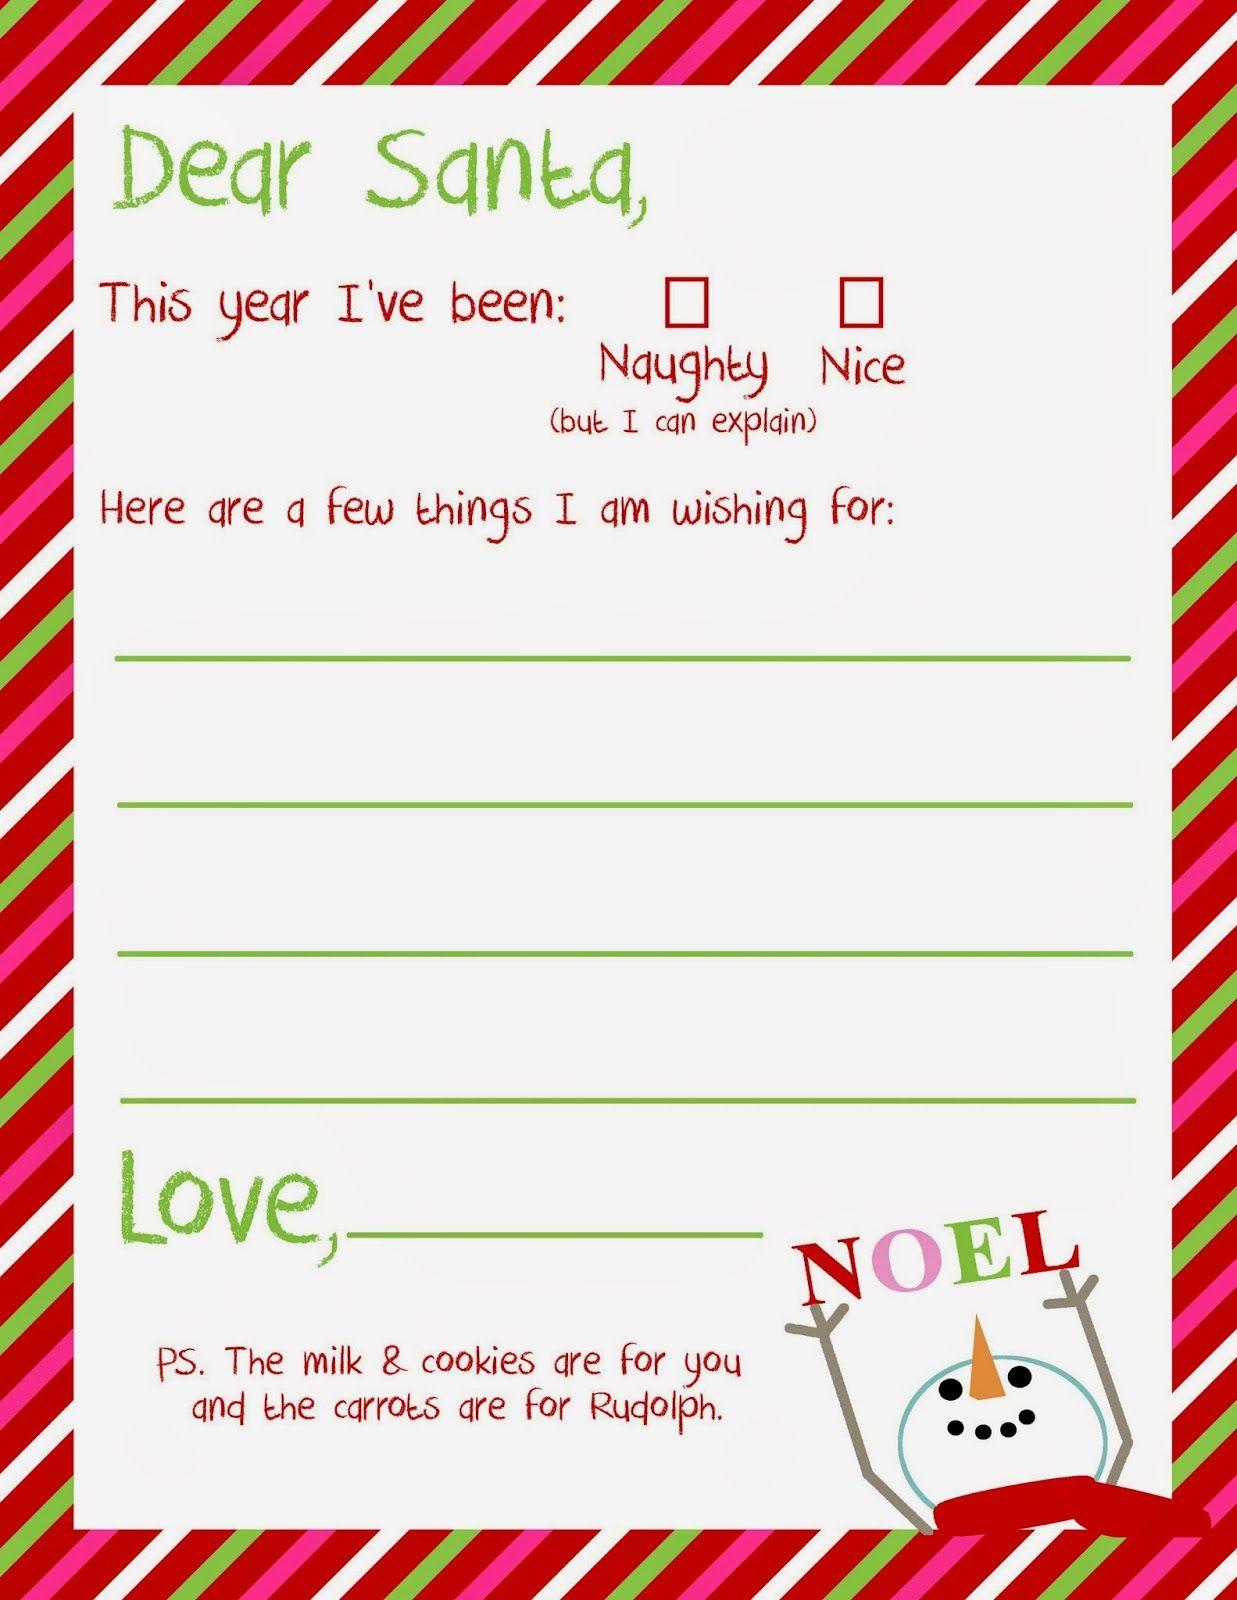 Dear Santa Letter Template - Dear Santa Letter Printable